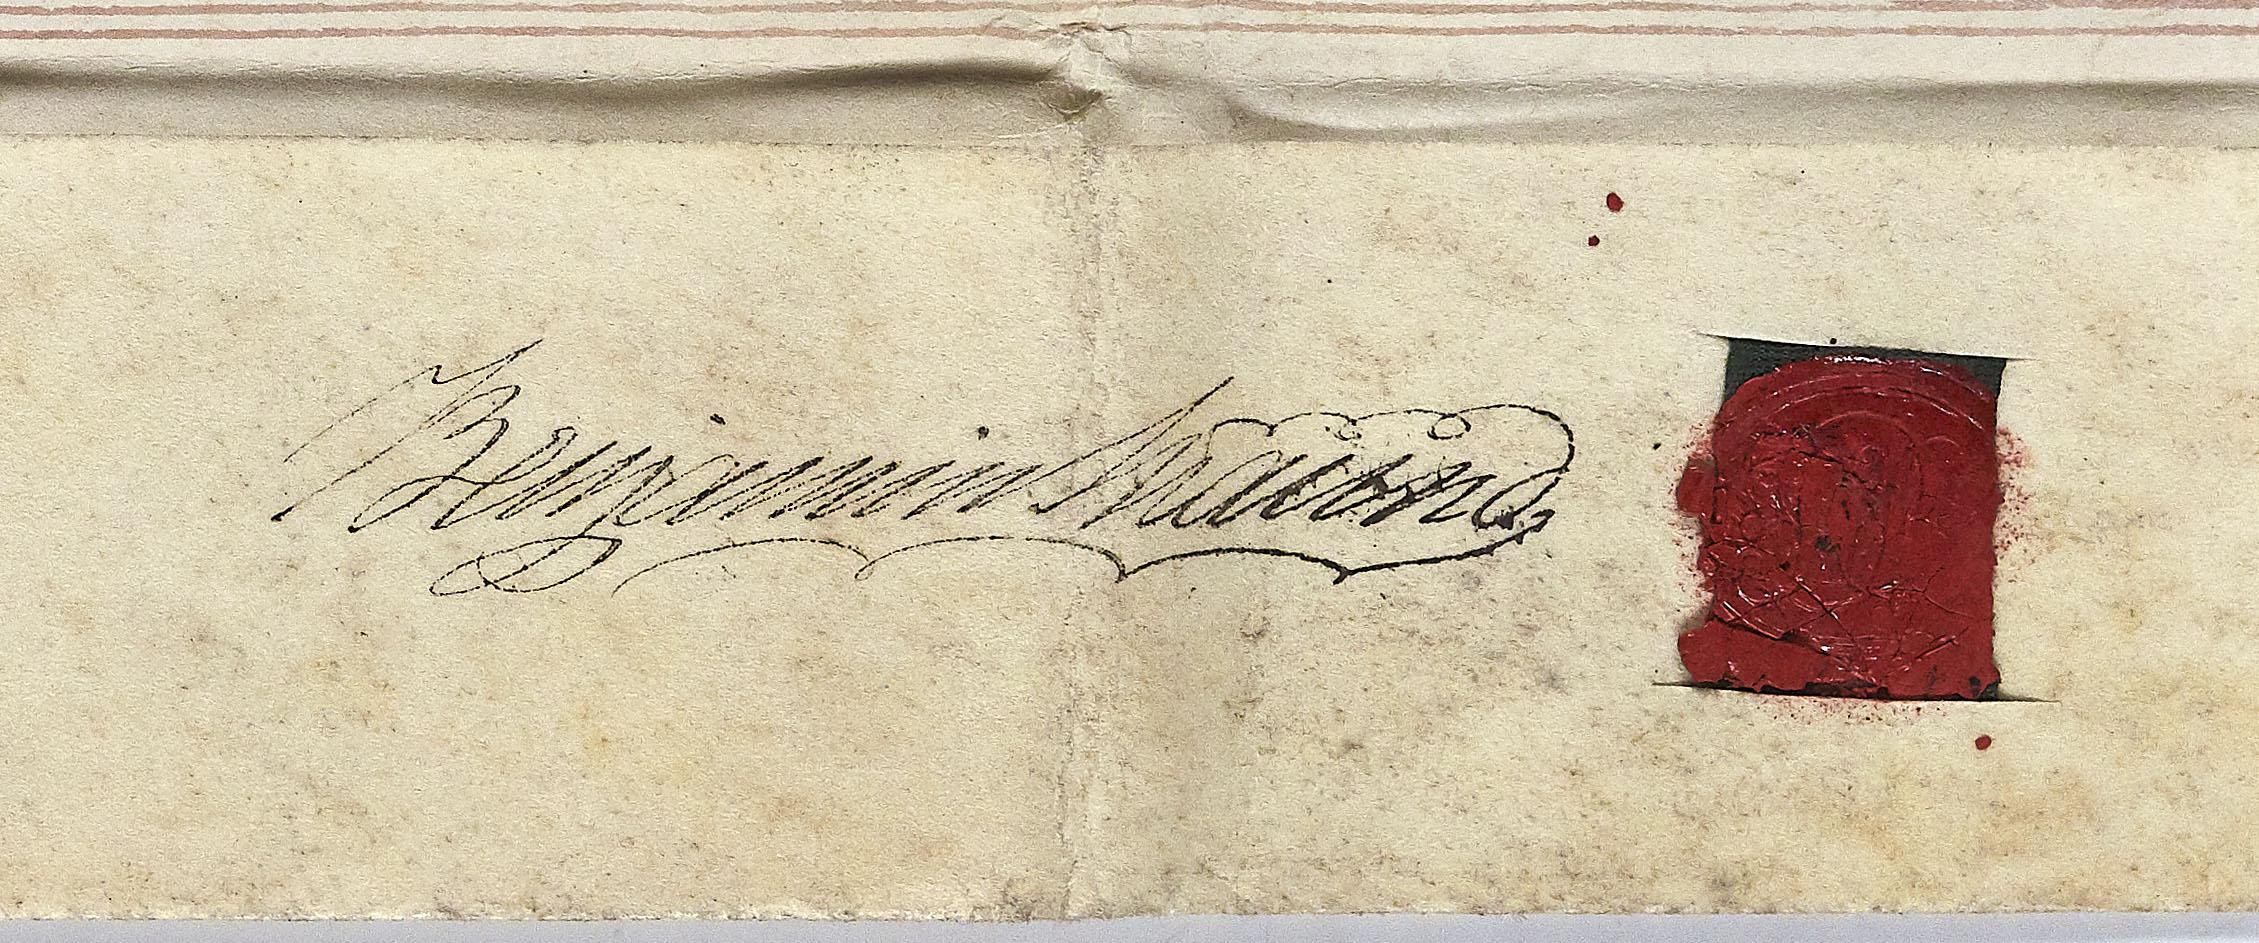 Signature of Benjamin Maund at Ref 705.1548 BA13566